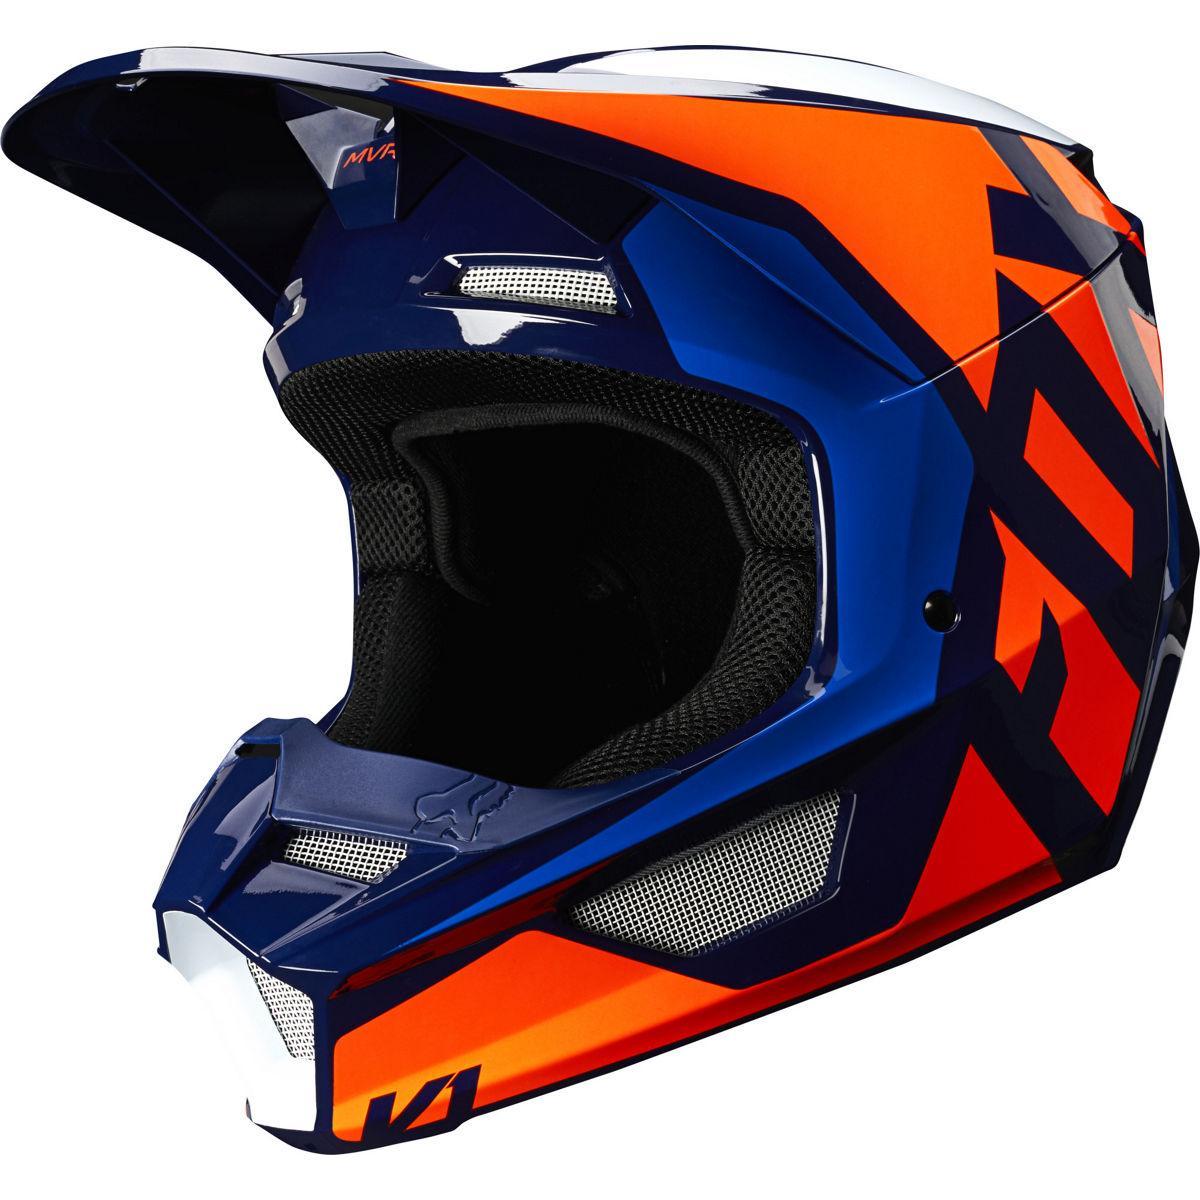 Мотошлем Fox V1 PRIX Helmet оранжевый/синий, XXL